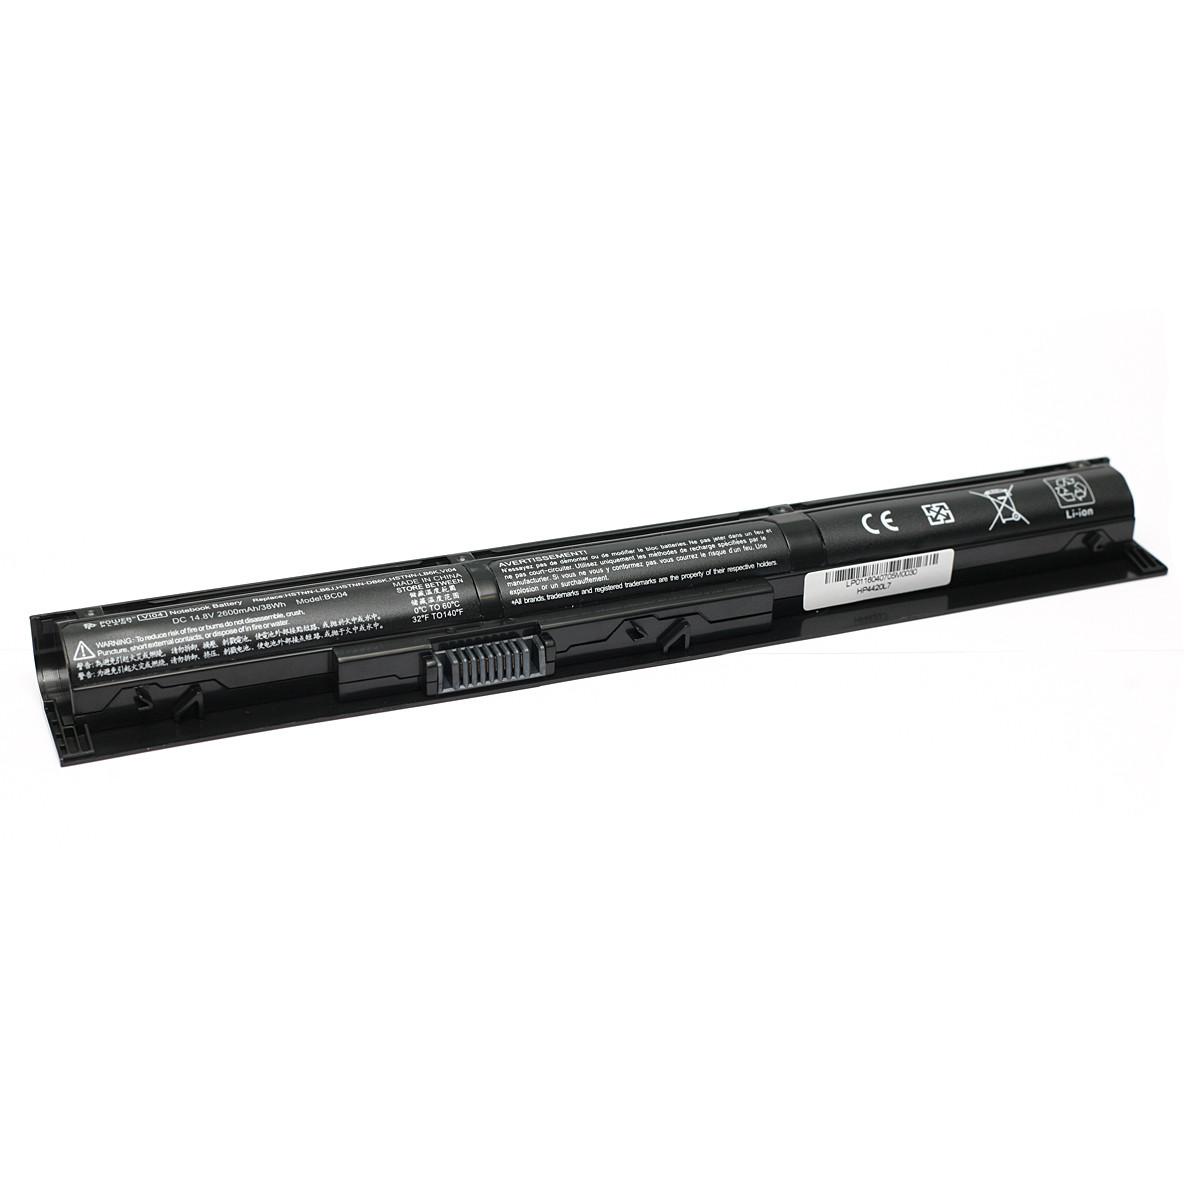 Аккумулятор PowerPlant для ноутбуков HP ProBook 440 G2 (HSTNN-LB6J, HP4420L7) 14.8V 2600mAh